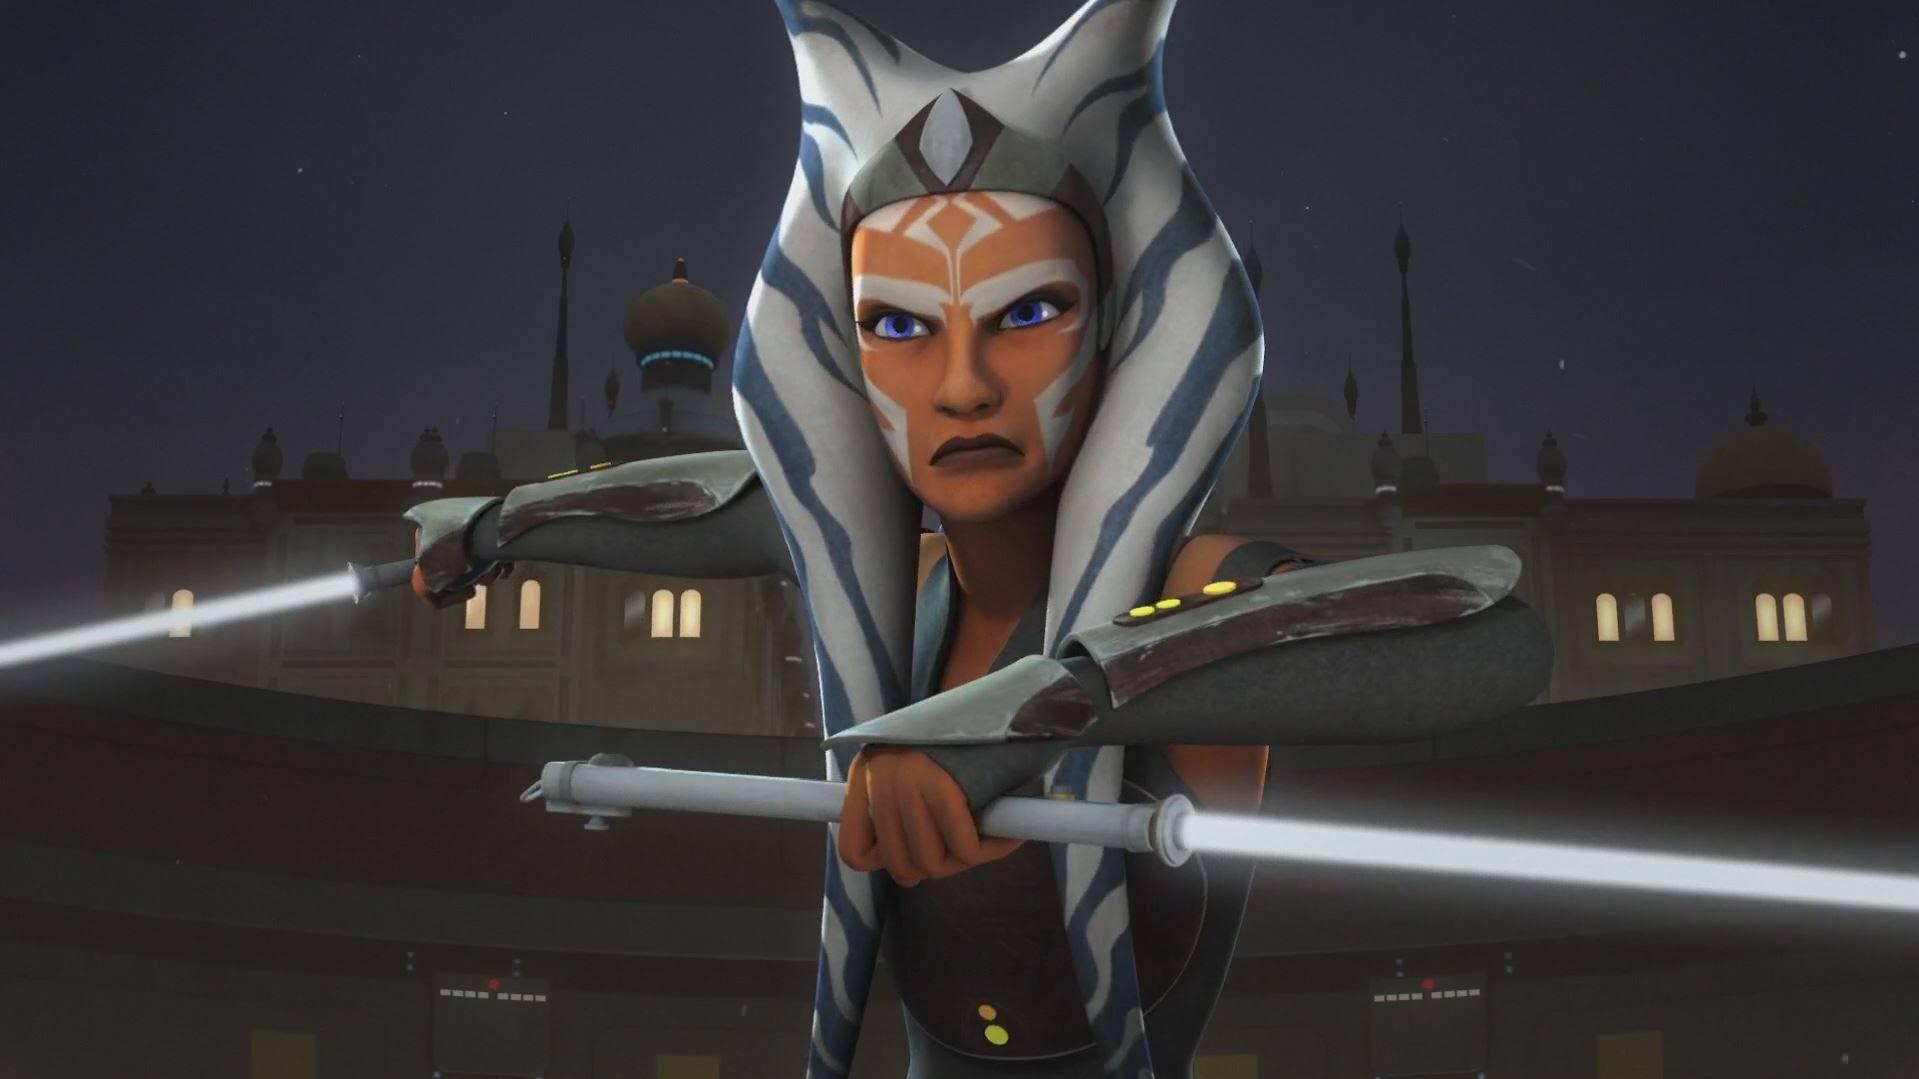 Ahsoka Tano yields a sword in Star Wars Rebels